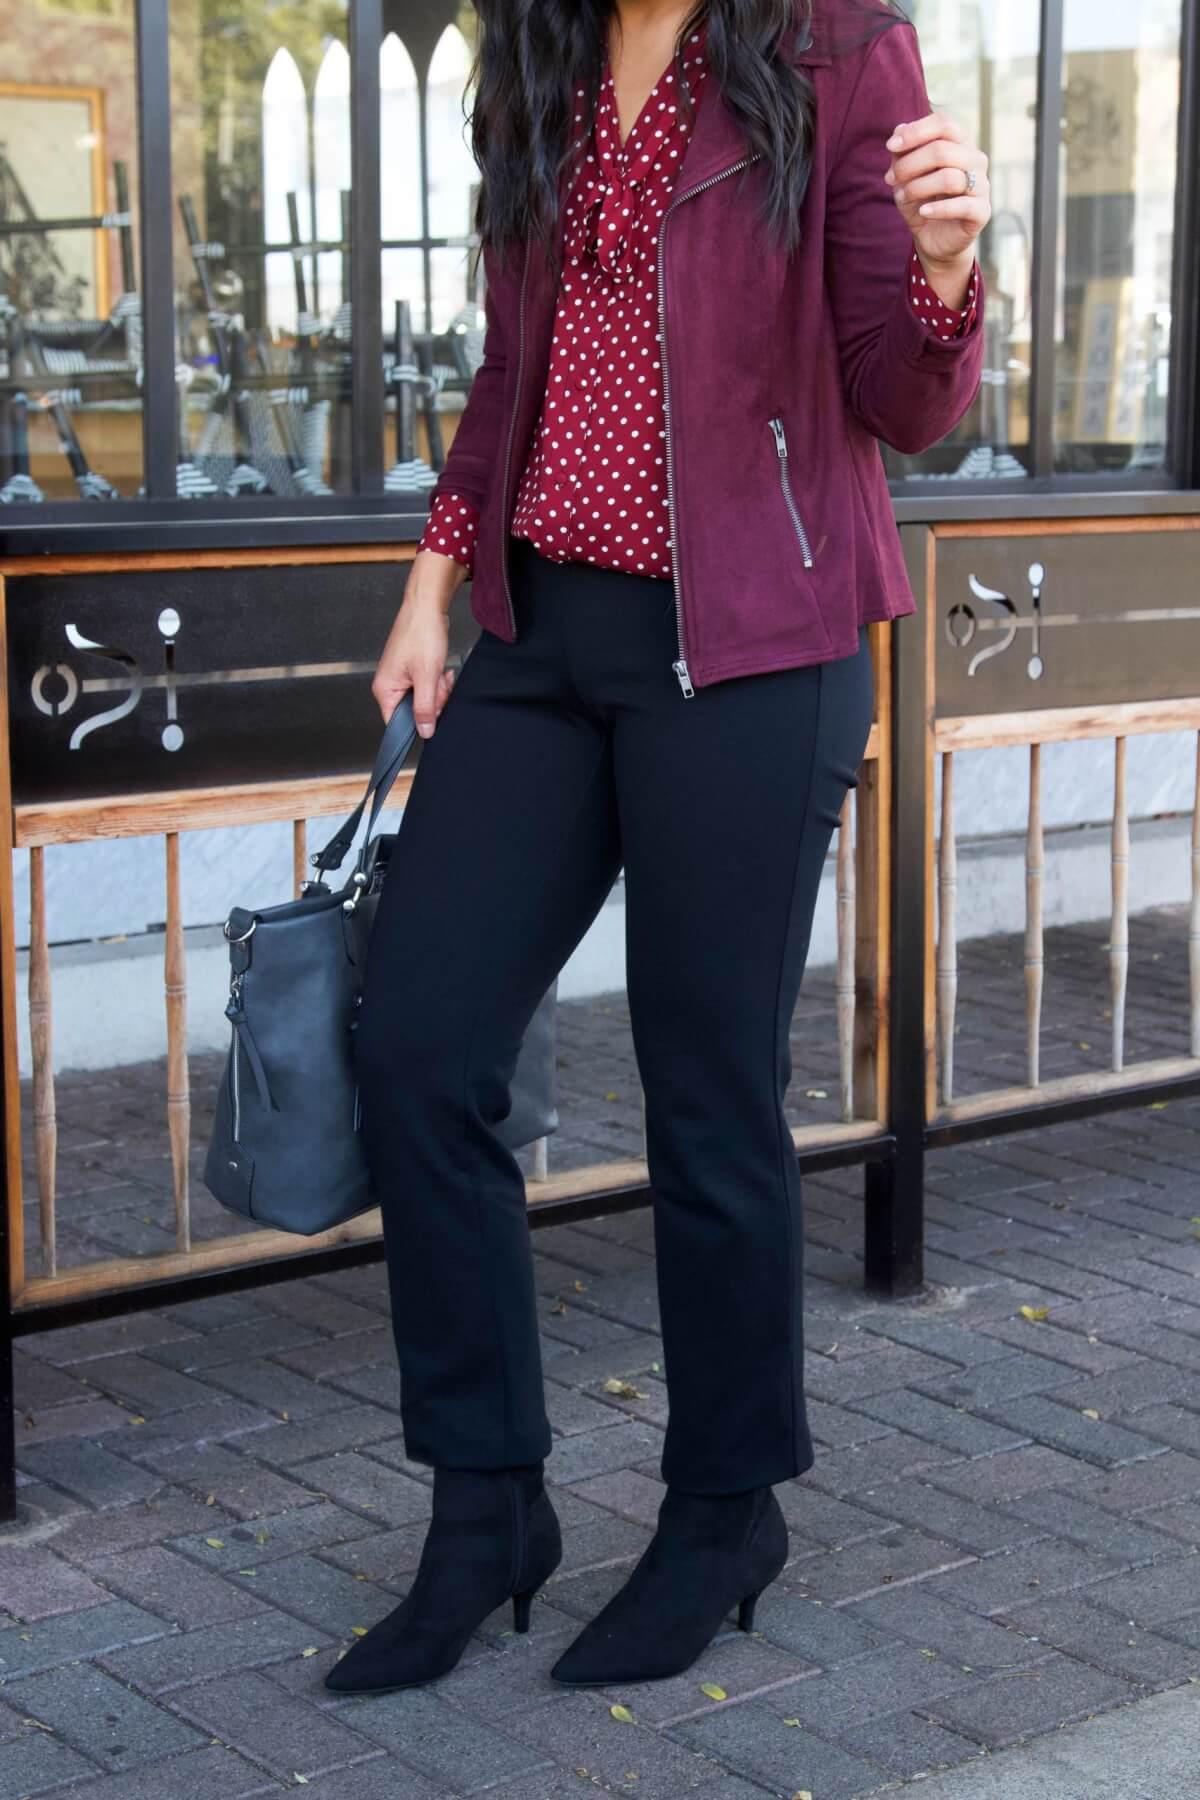 Boots with straight leg jeans: burgundy polka dot blouse, maroon moto jacket, black pants, black boots, gray handbag